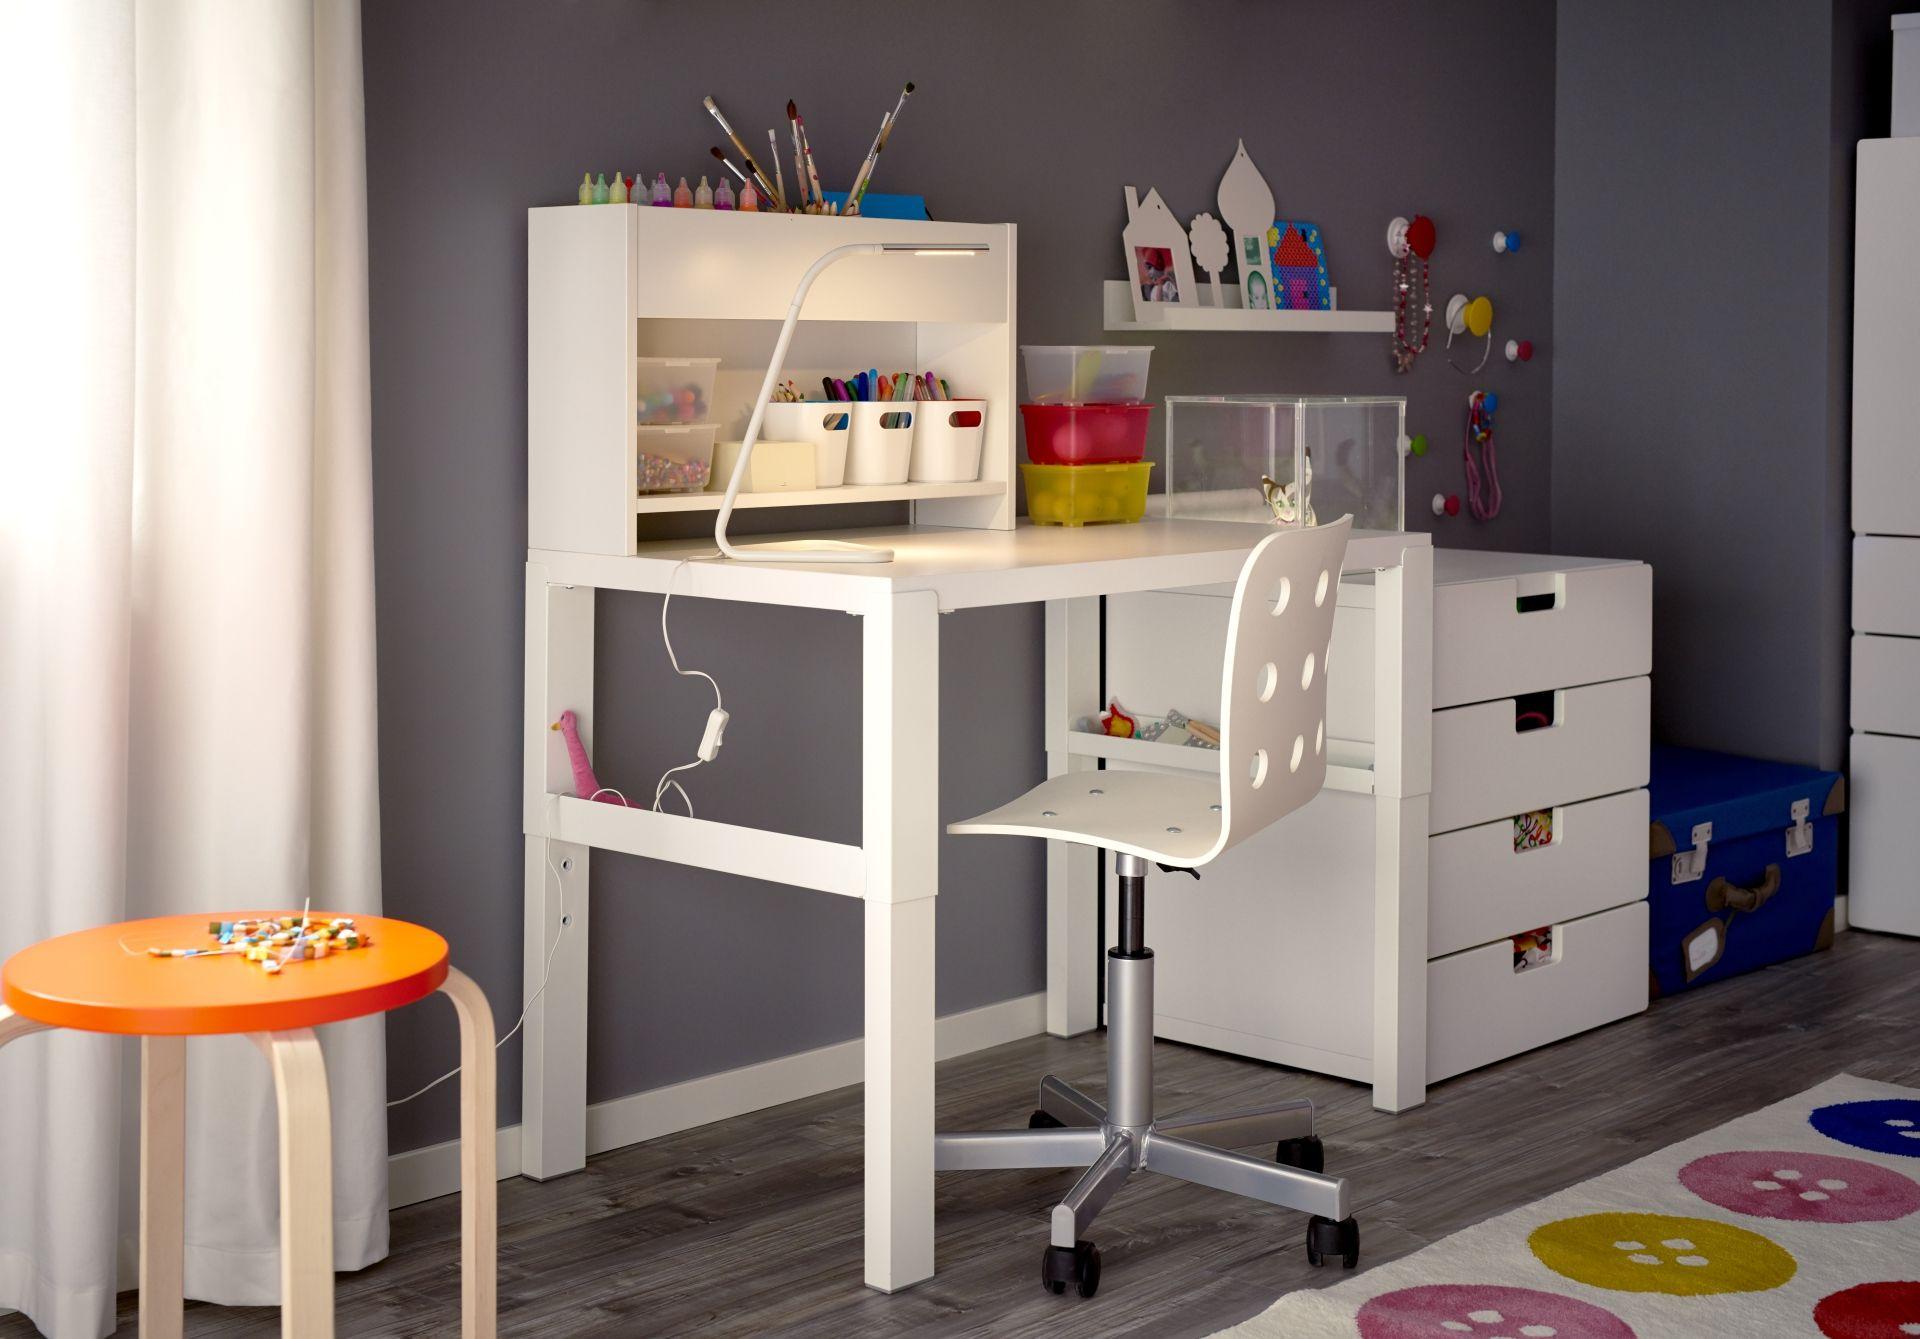 PÅhl bureau met opbouwdeel wit boys room pinterest desk ikea